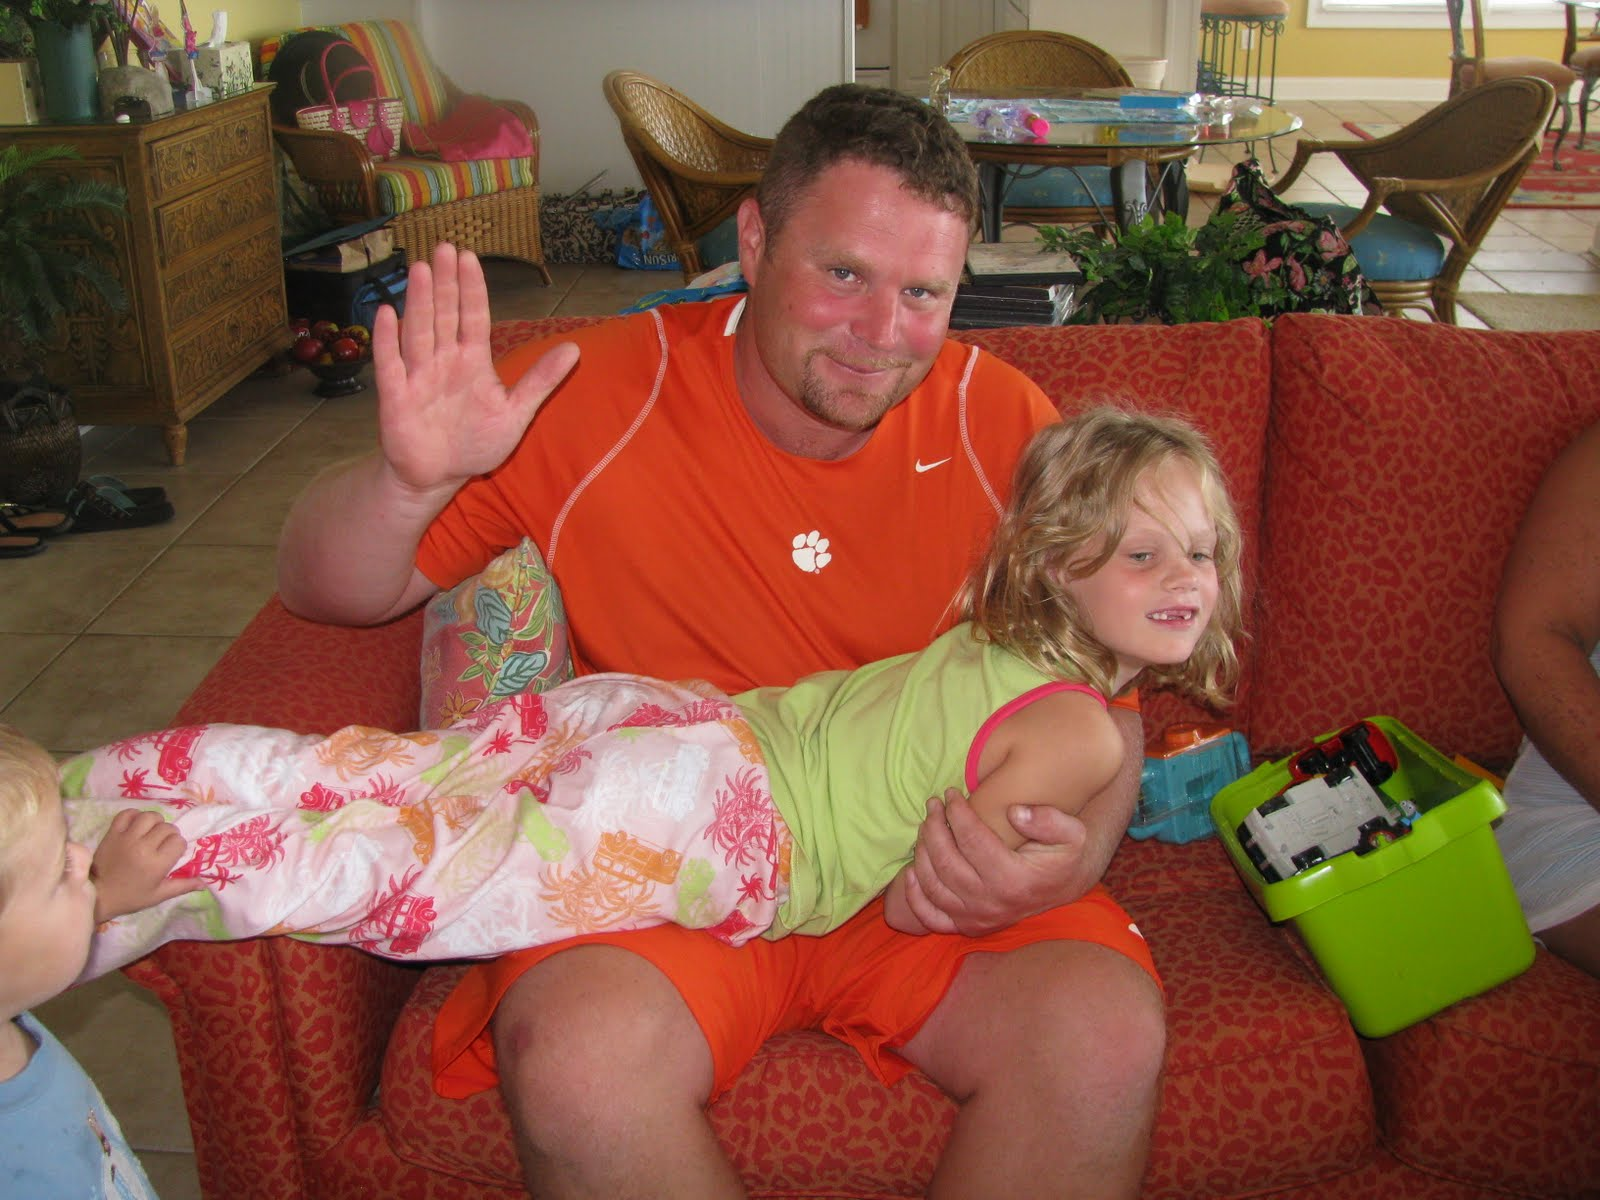 Family spank blog